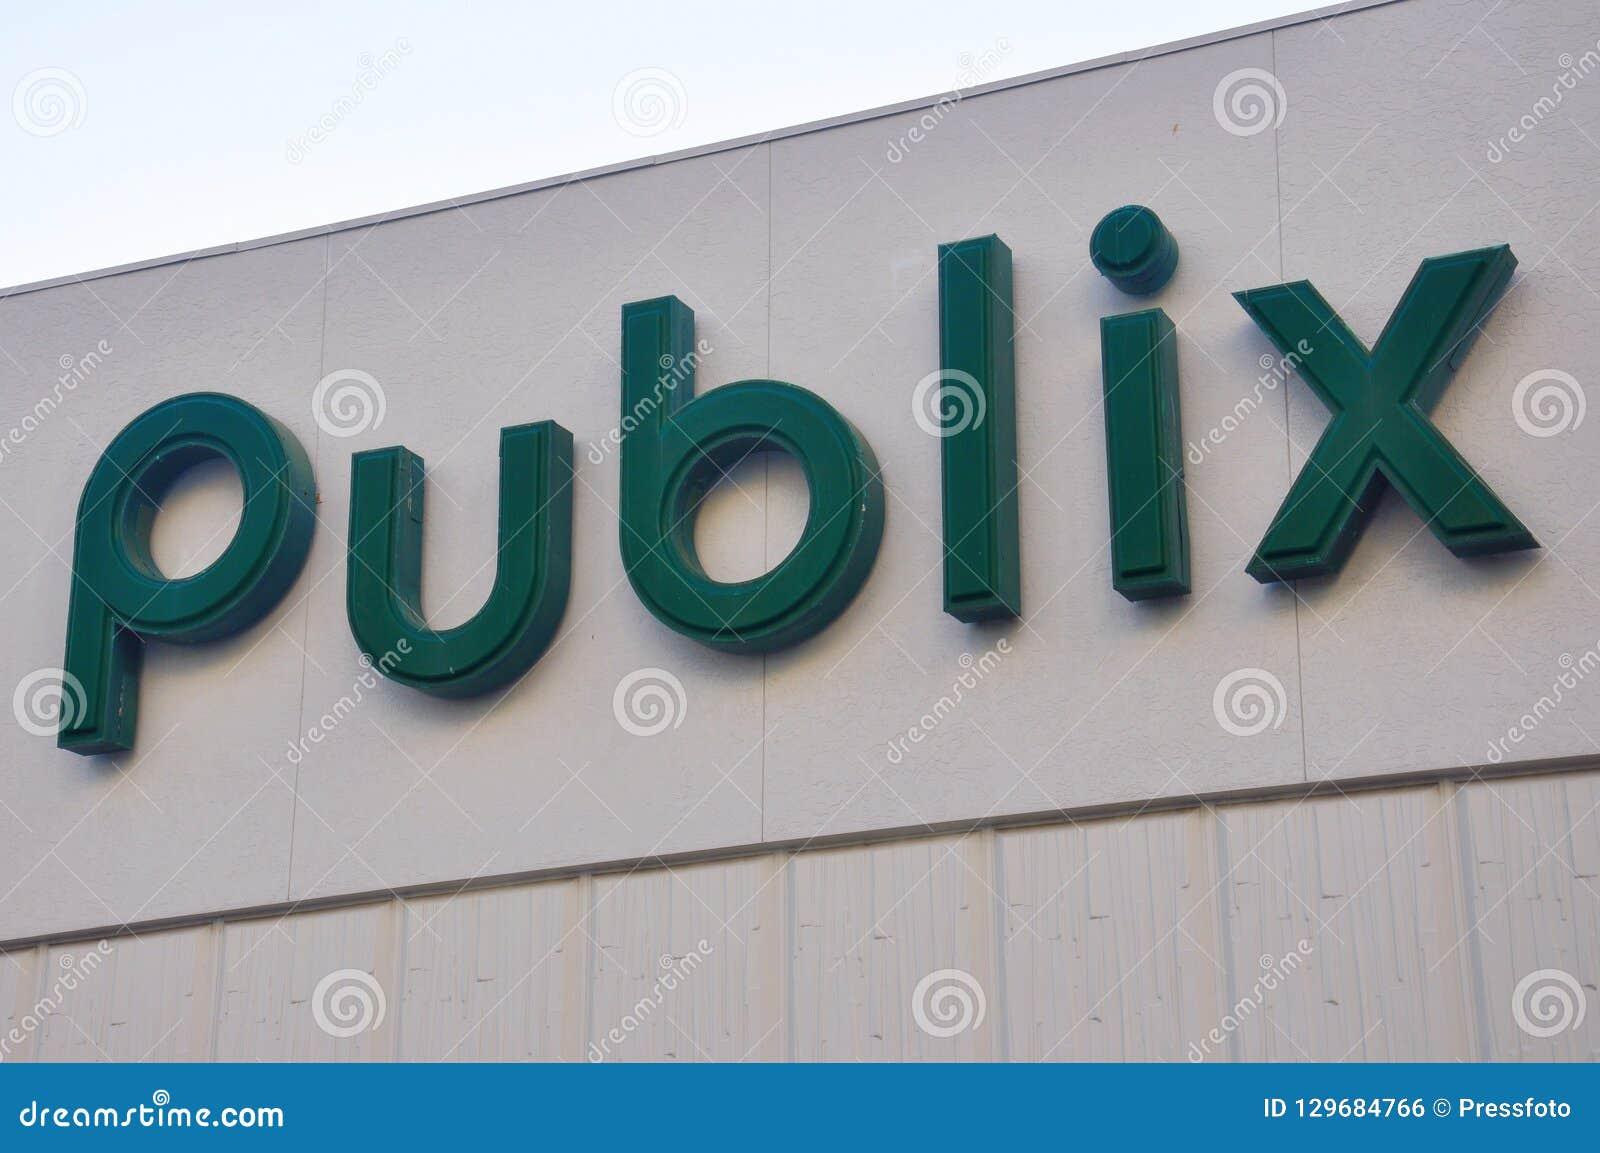 Publix supermarket in Miami, Florida, USA